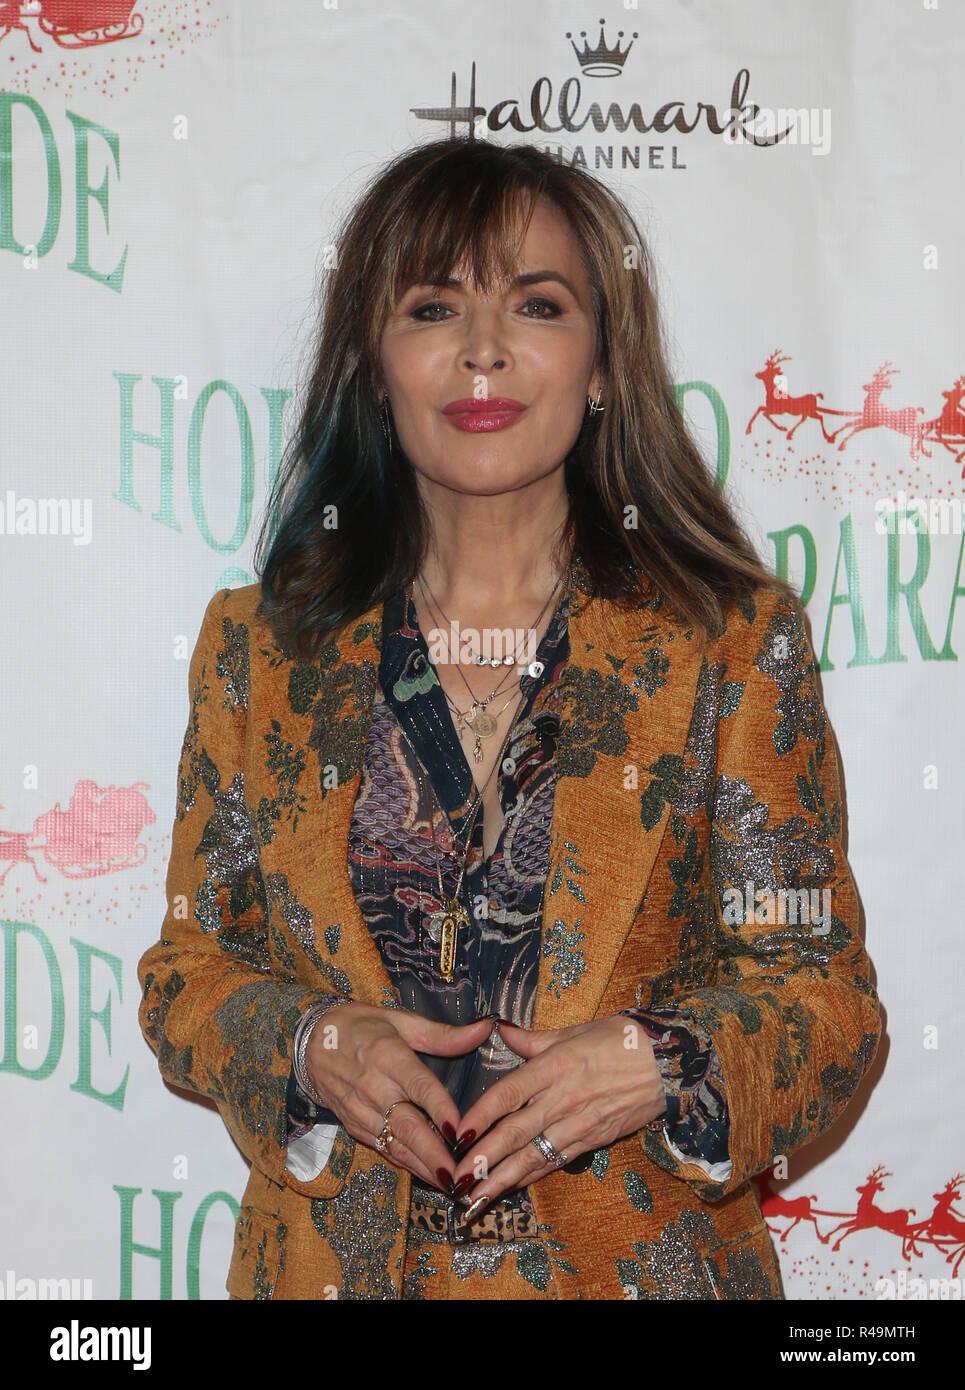 Hollywood Christmas Parade 2019.Hollywood Ca 25th Nov 2018 Lauren Koslow At 87th Annual